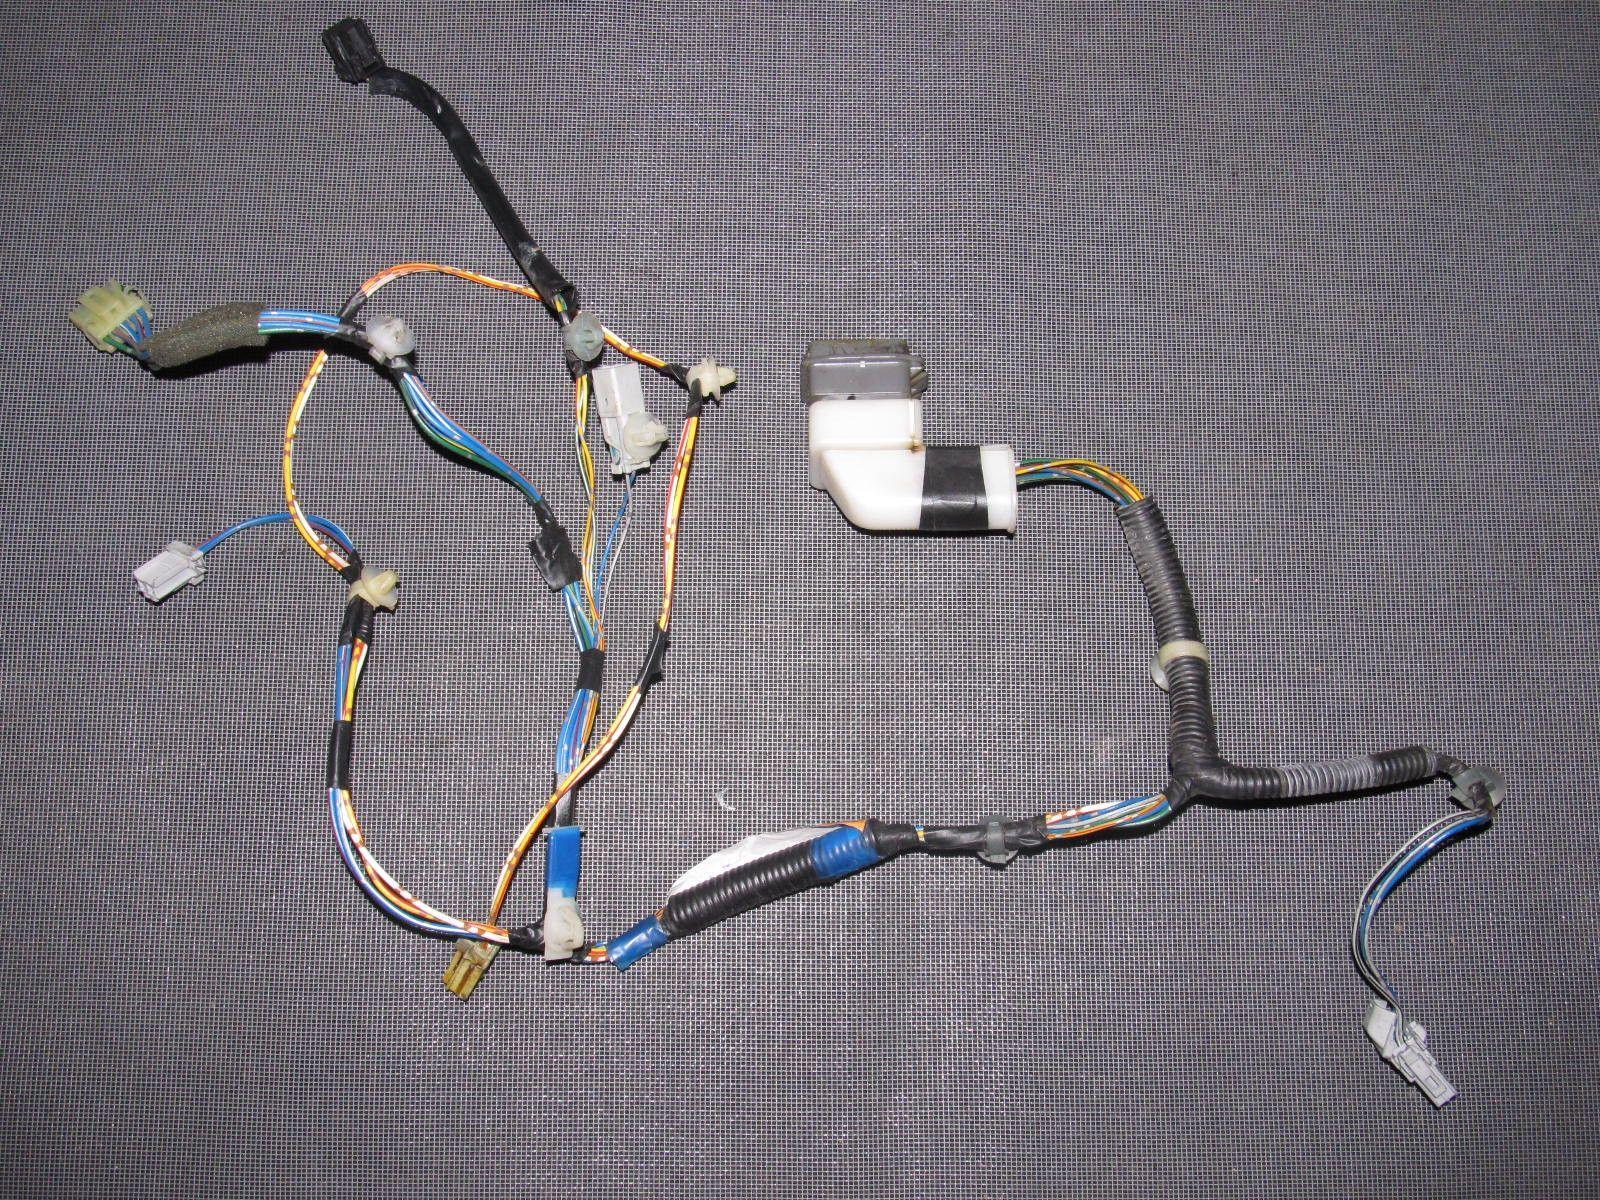 96 97 98 99 00 honda civic oem door wiring harness right rh pinterest com